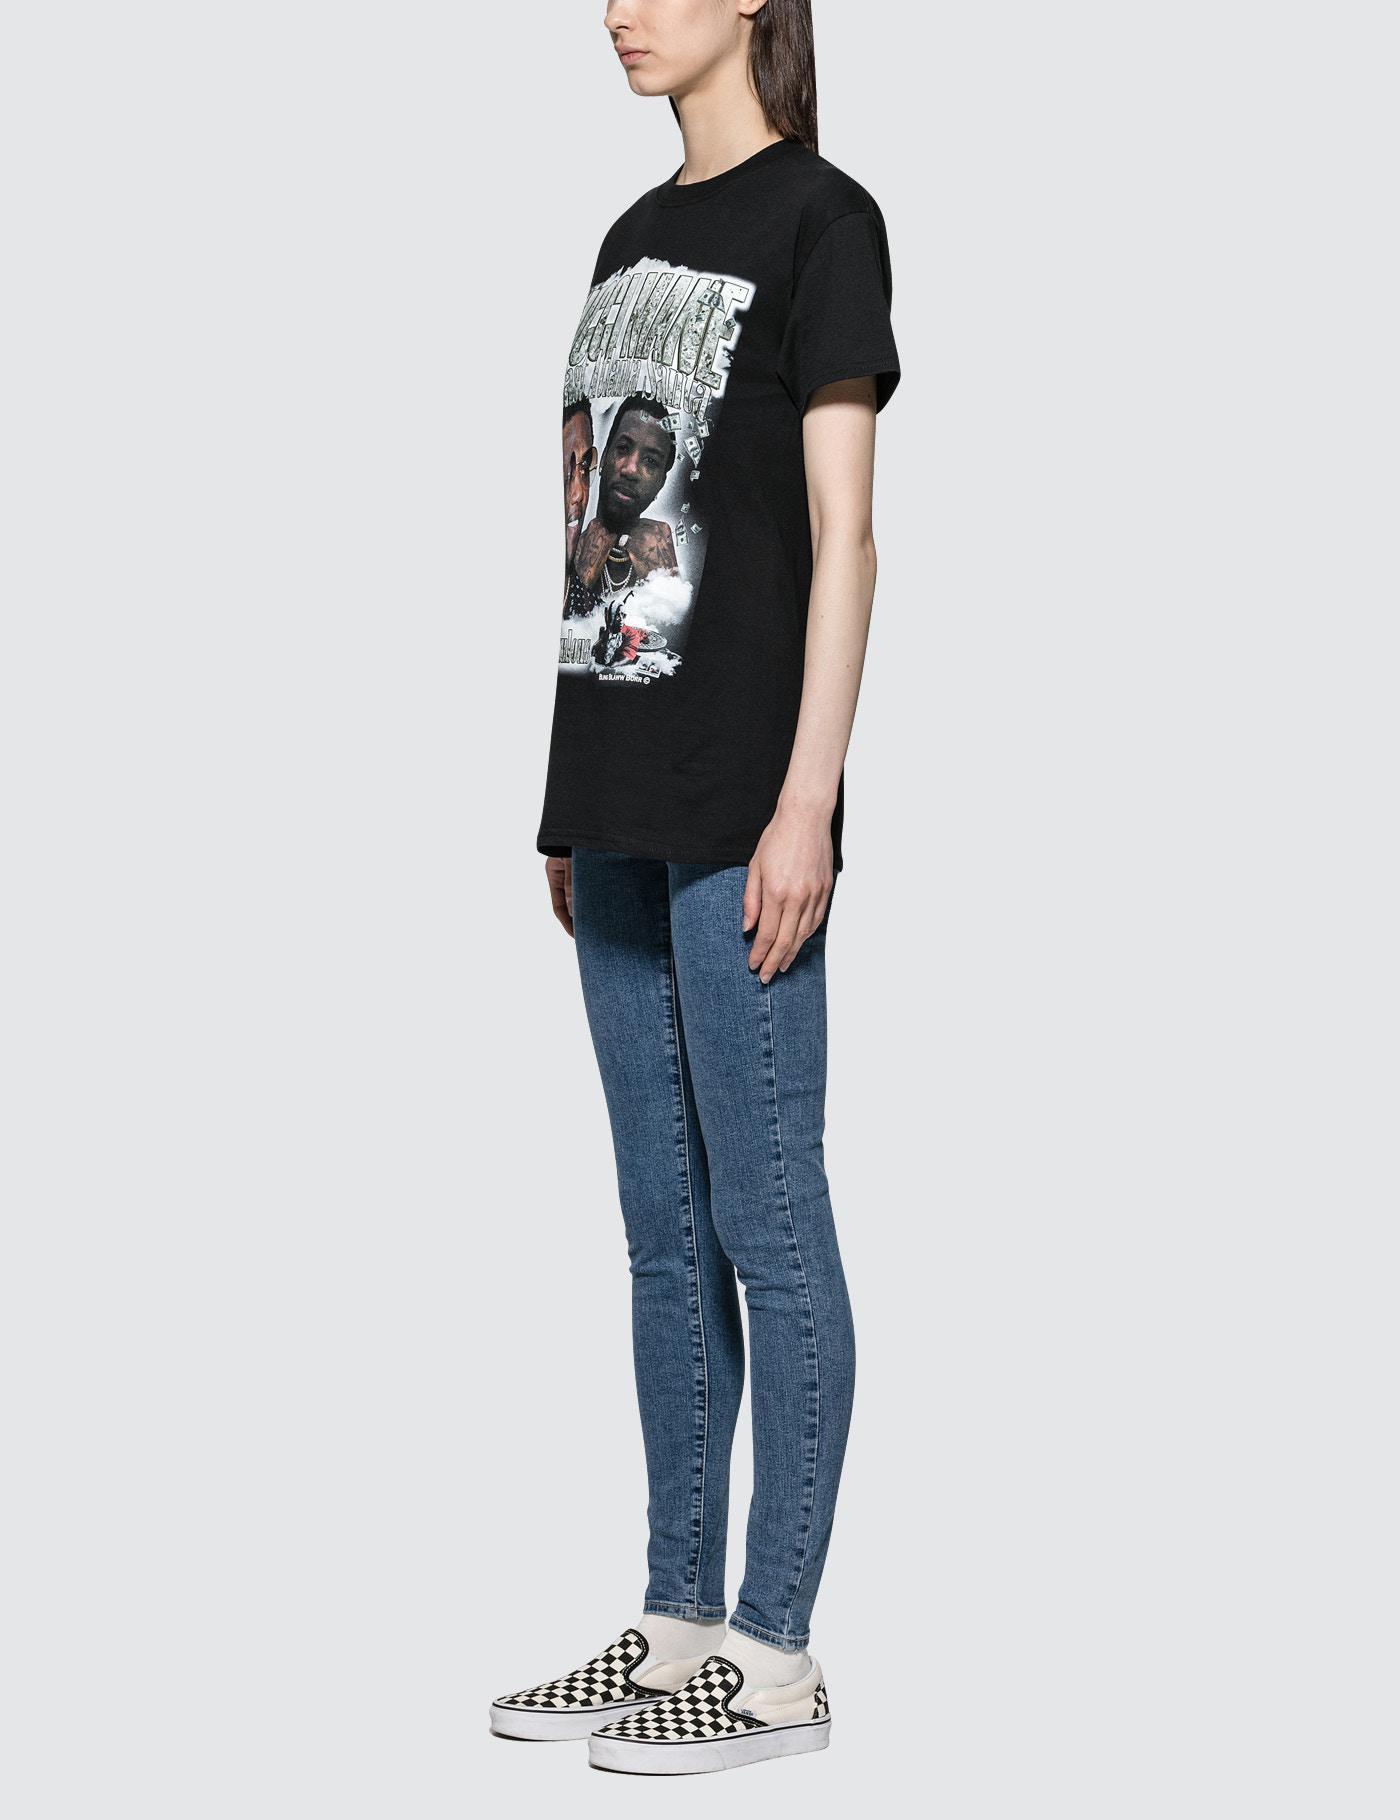 bb4b256b Homage Tees Gucci Mane S/s T-shirt in Black - Lyst